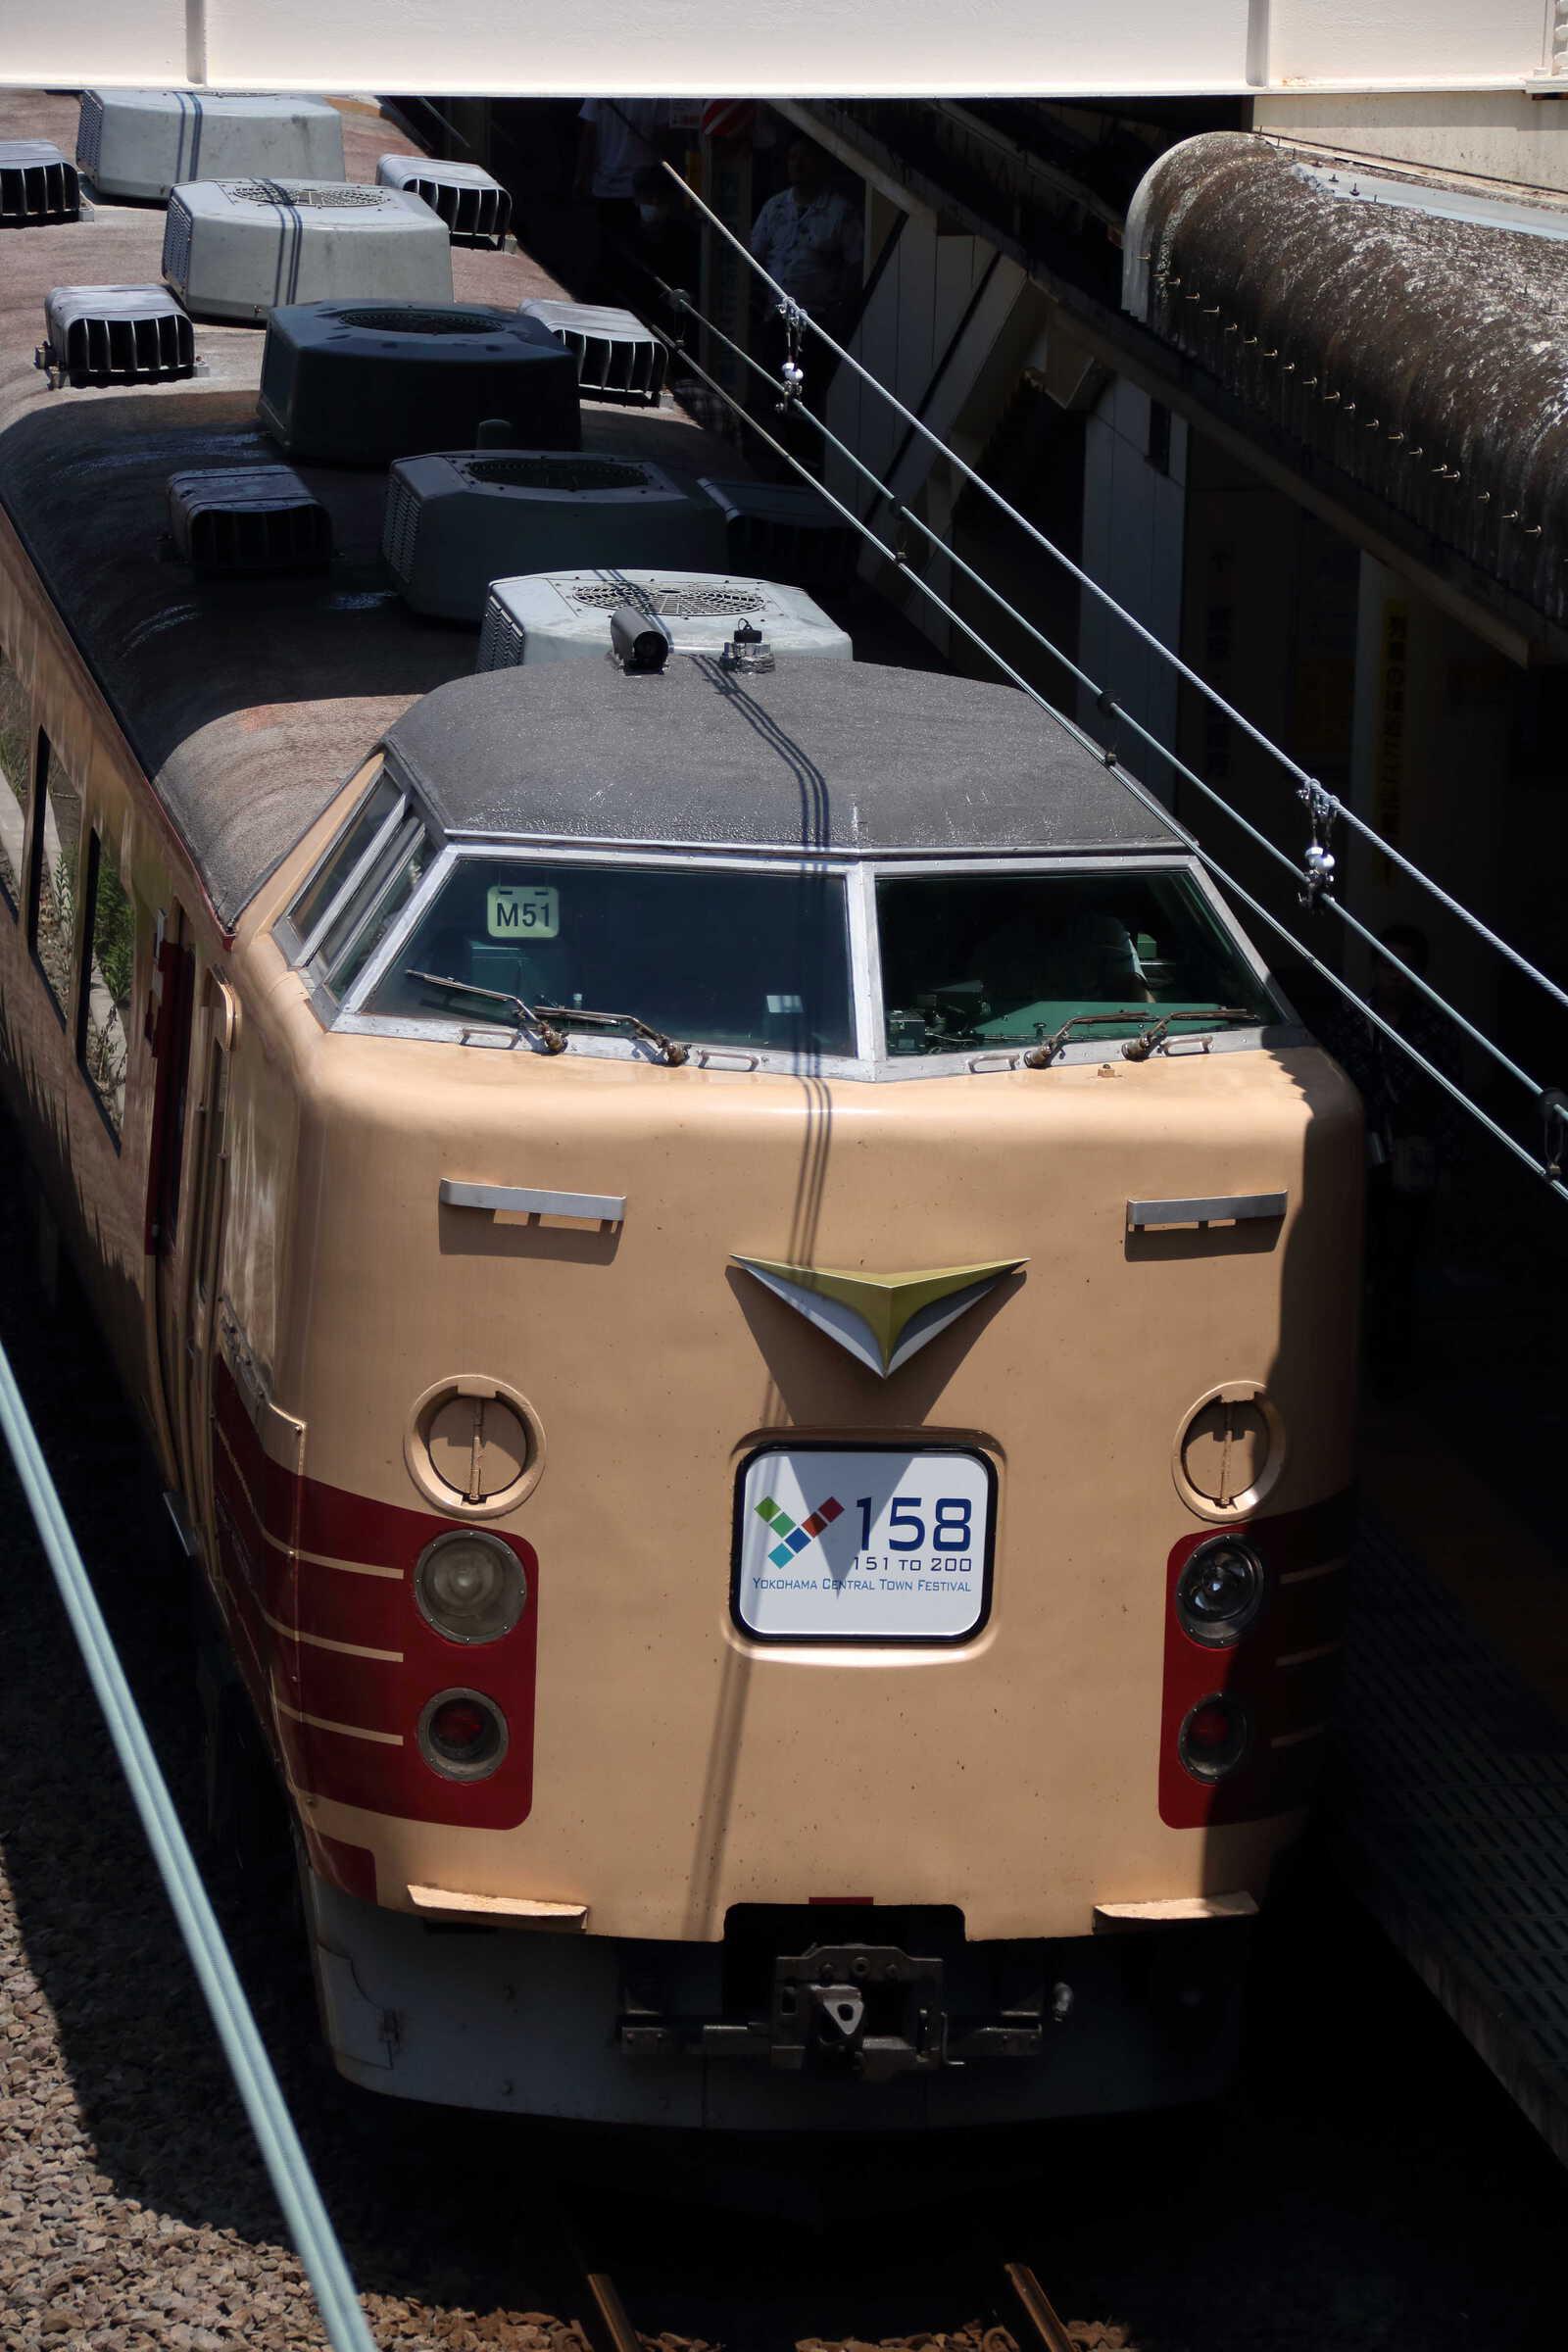 9826M 団臨(浜504) 横浜セントラルタウンフェスティバルY158記念列車の旅 189系 八トタM51編成